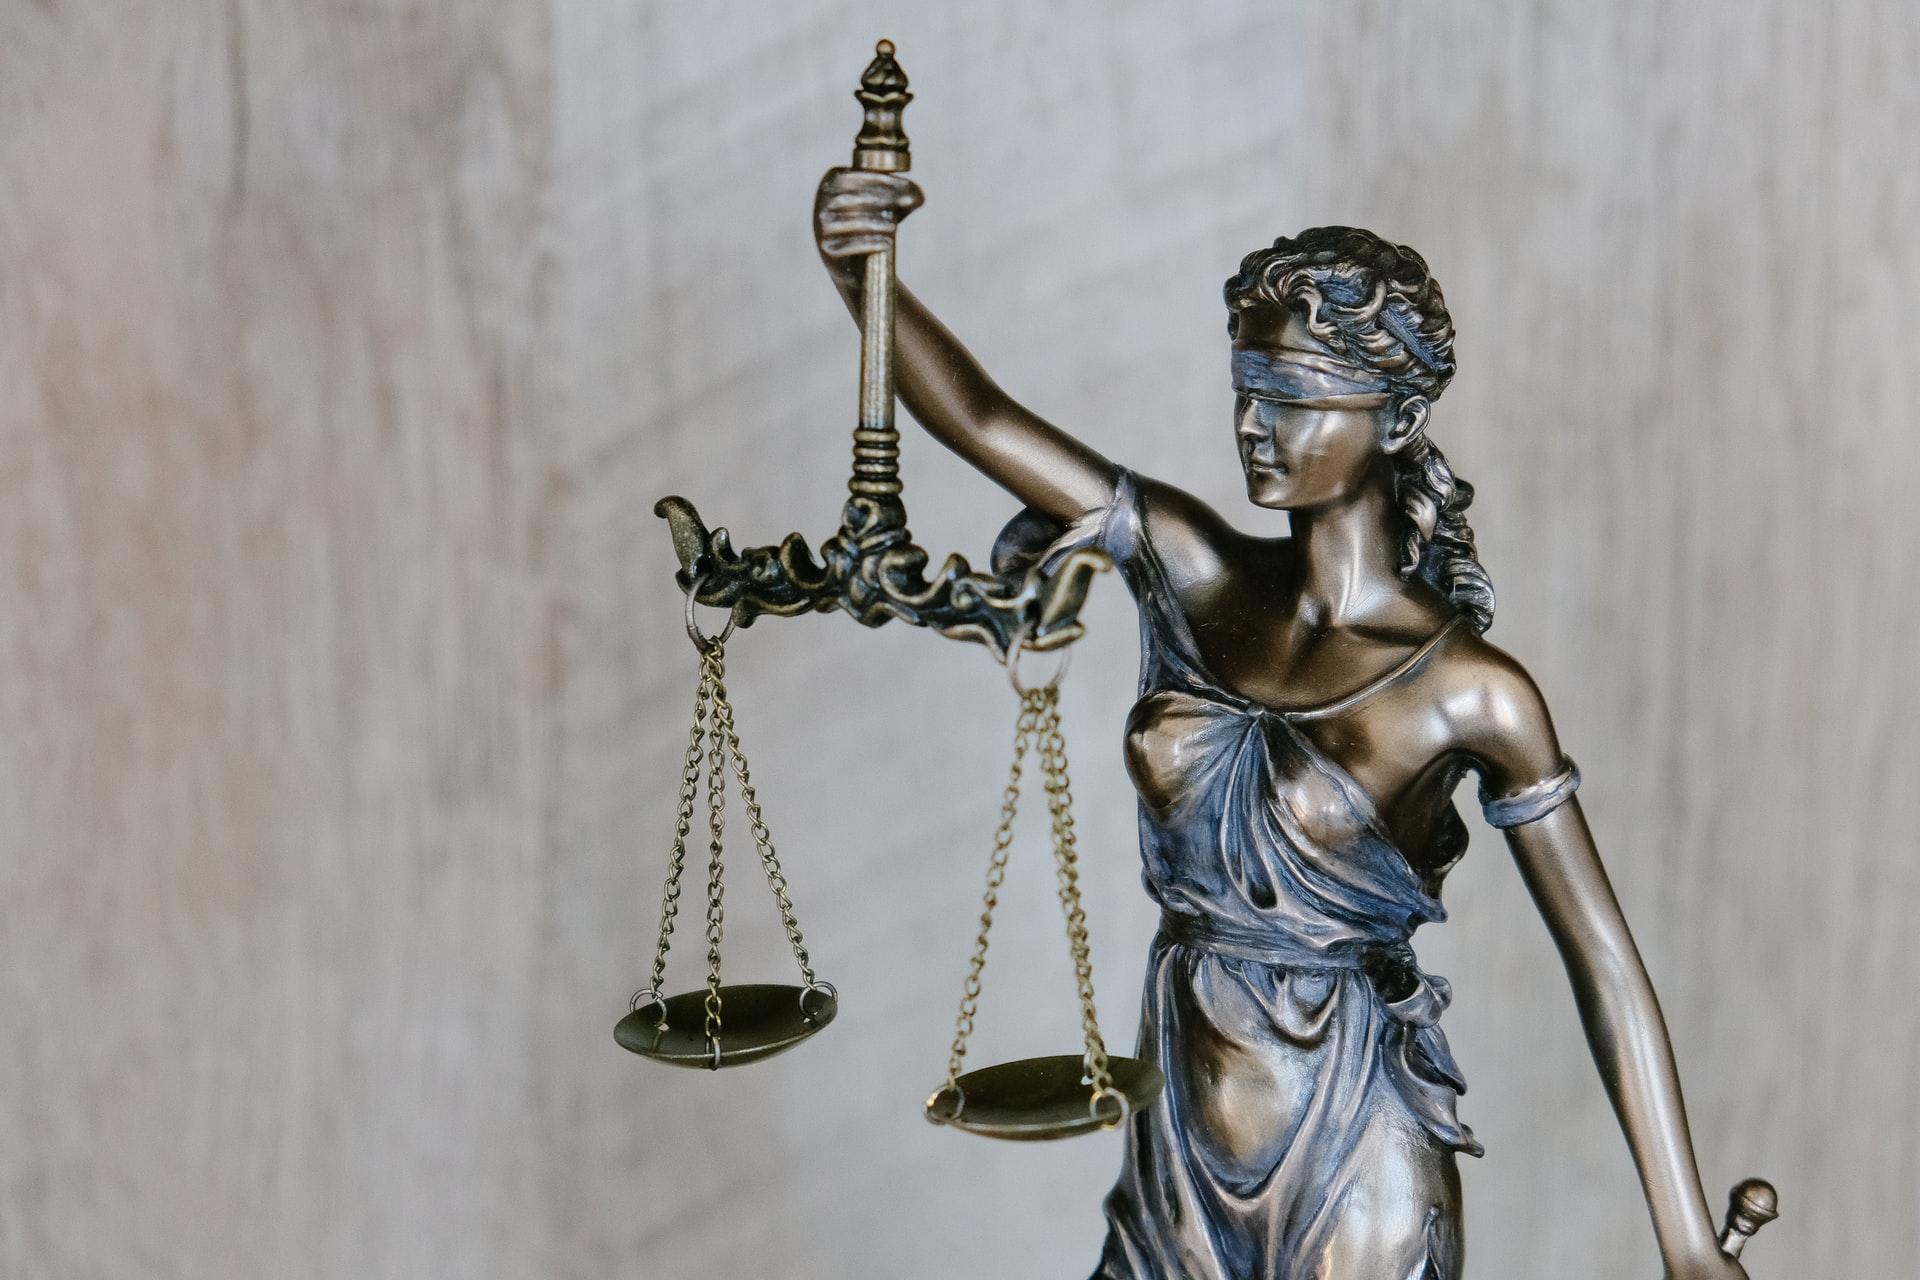 tingey-injury-law-firm-unsplash.jpg